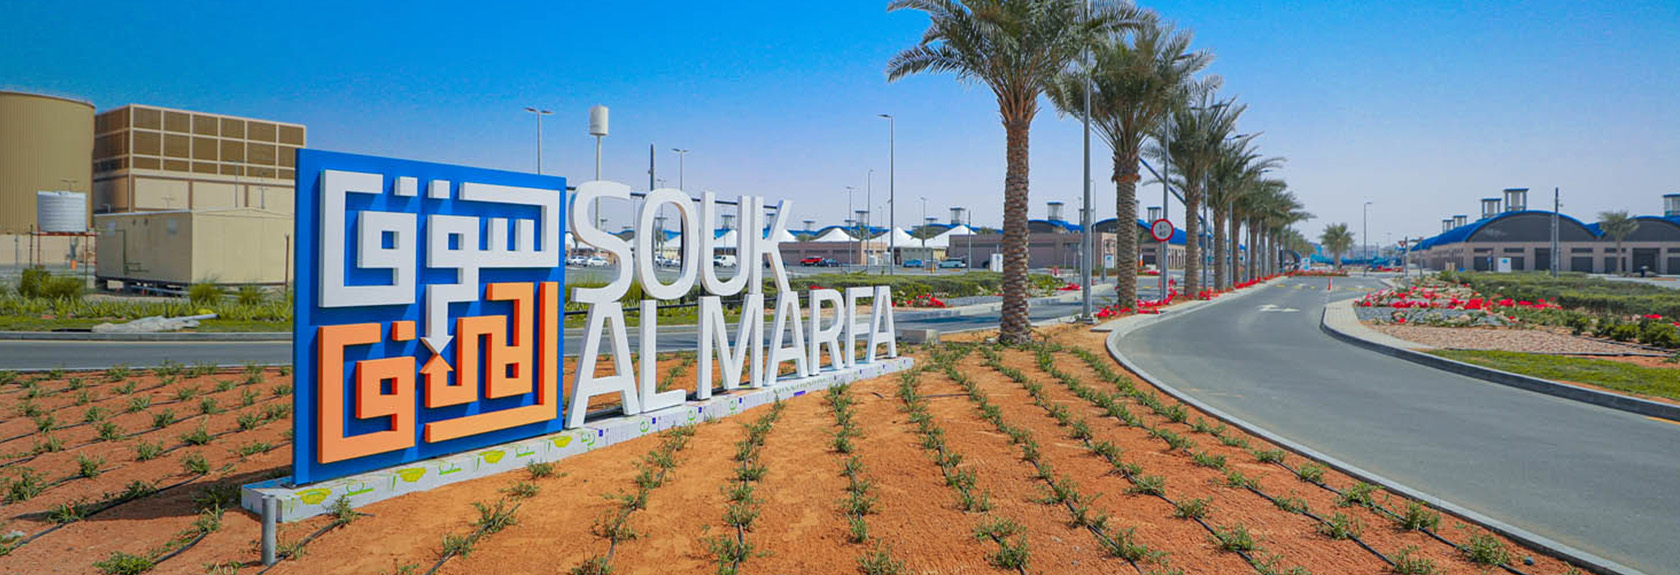 Souk Al Marfa